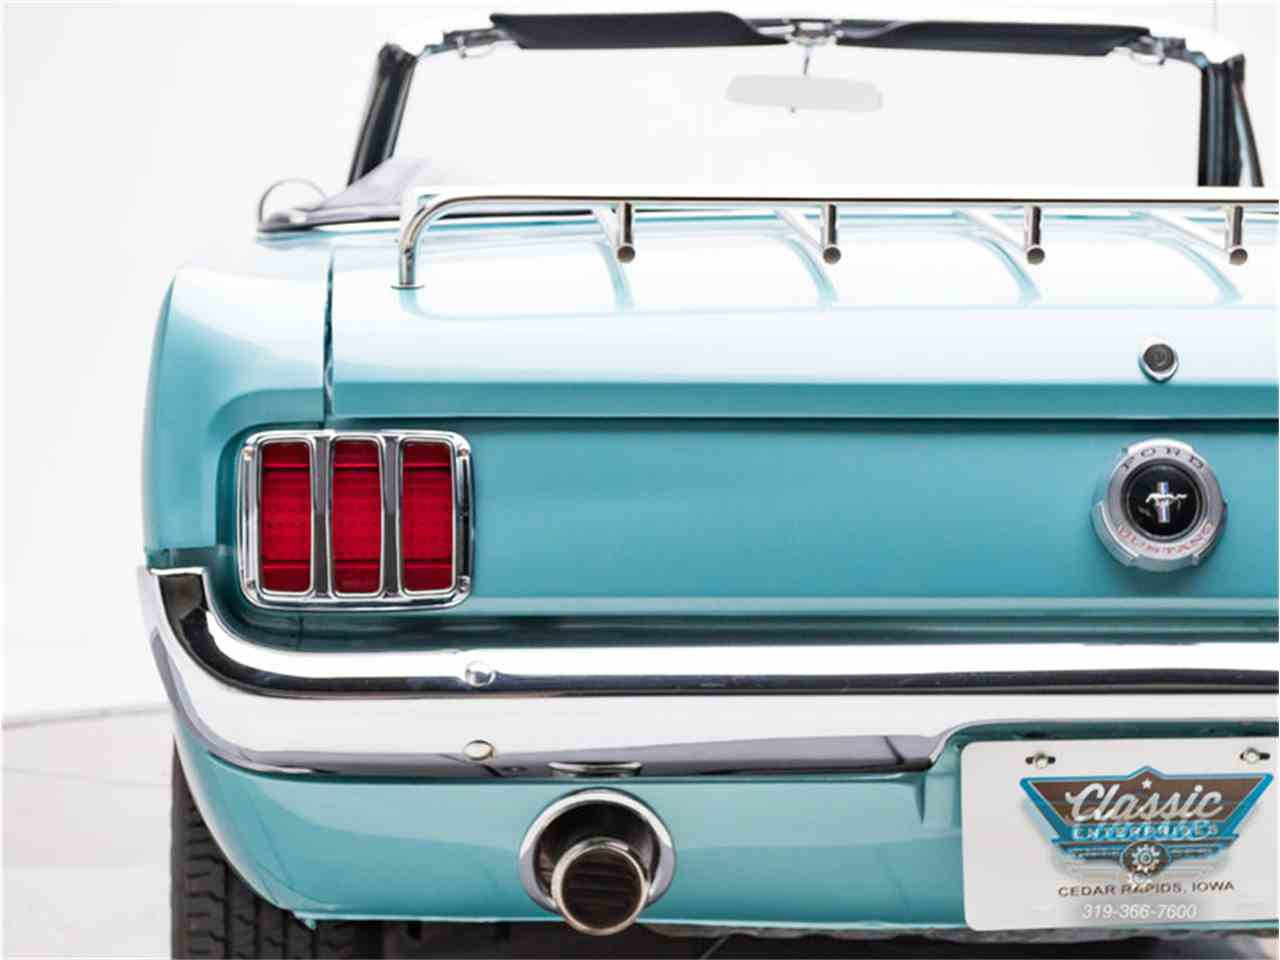 Classic Car Dealers Cedar Rapids Iowa